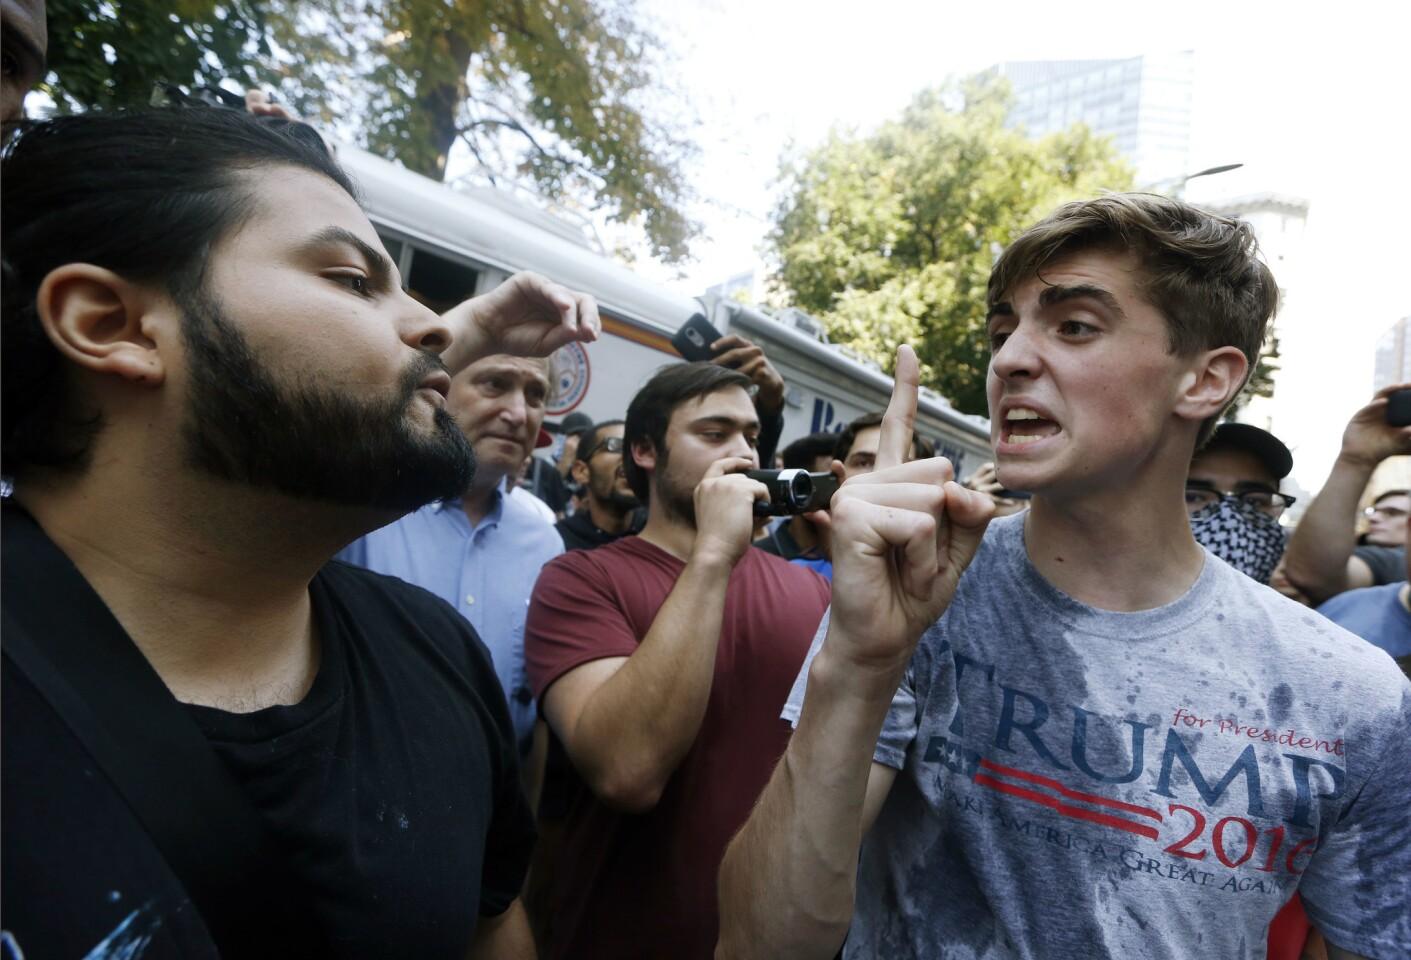 'Free speech' rally in Boston